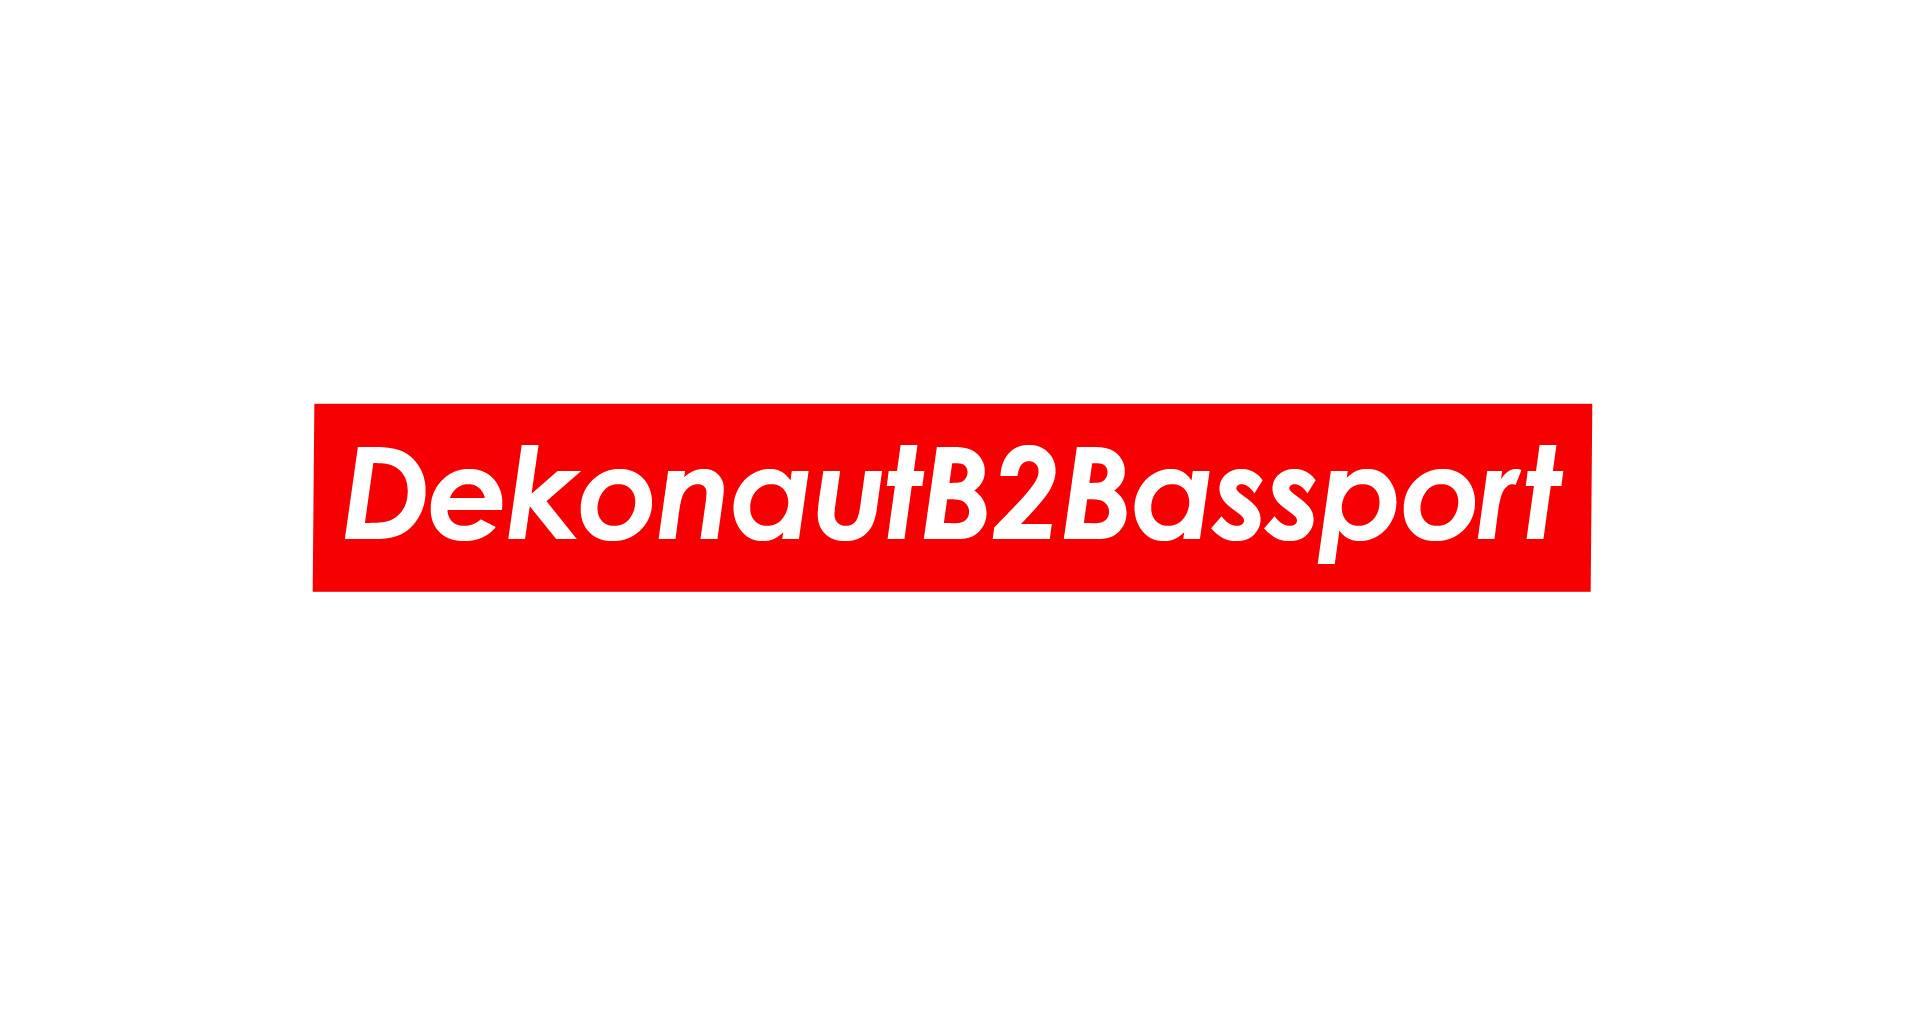 Dekonaut B2Bassport – Rosis